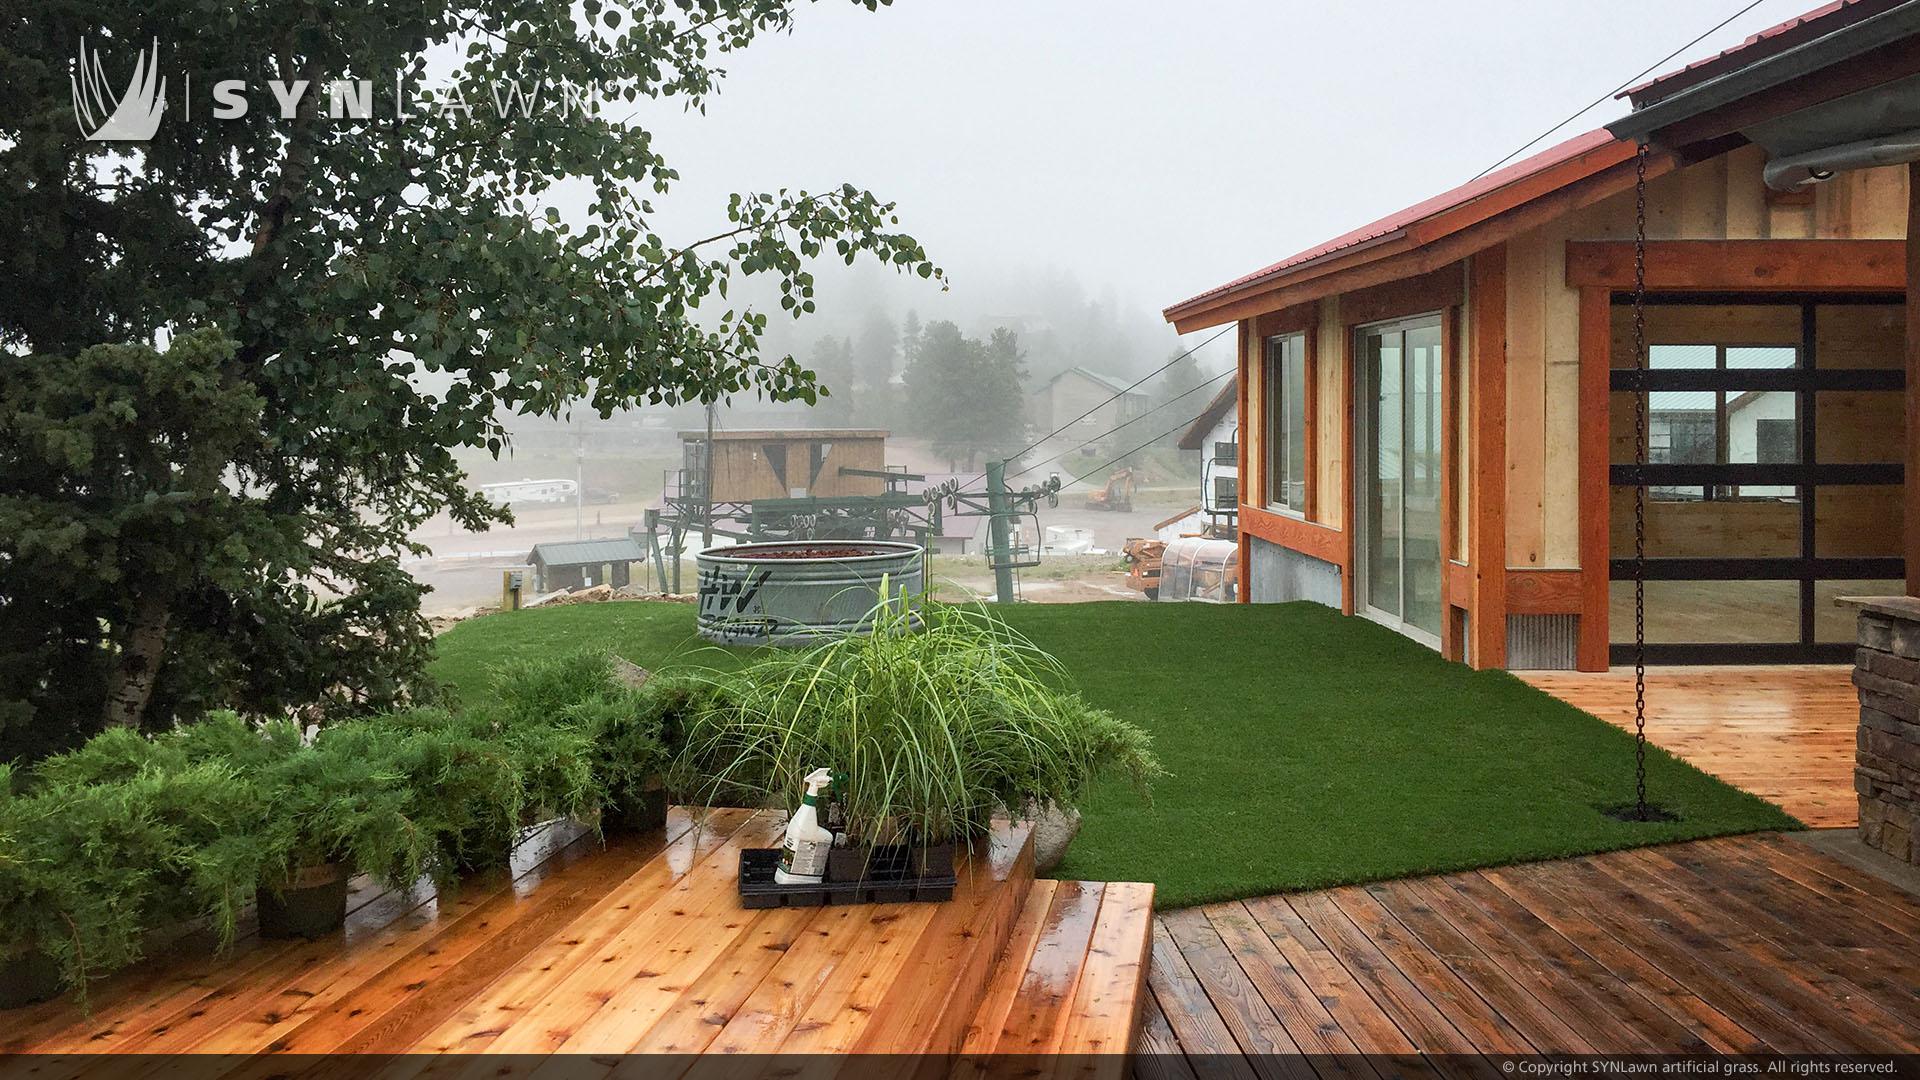 residential artificial grass installation in Georgia